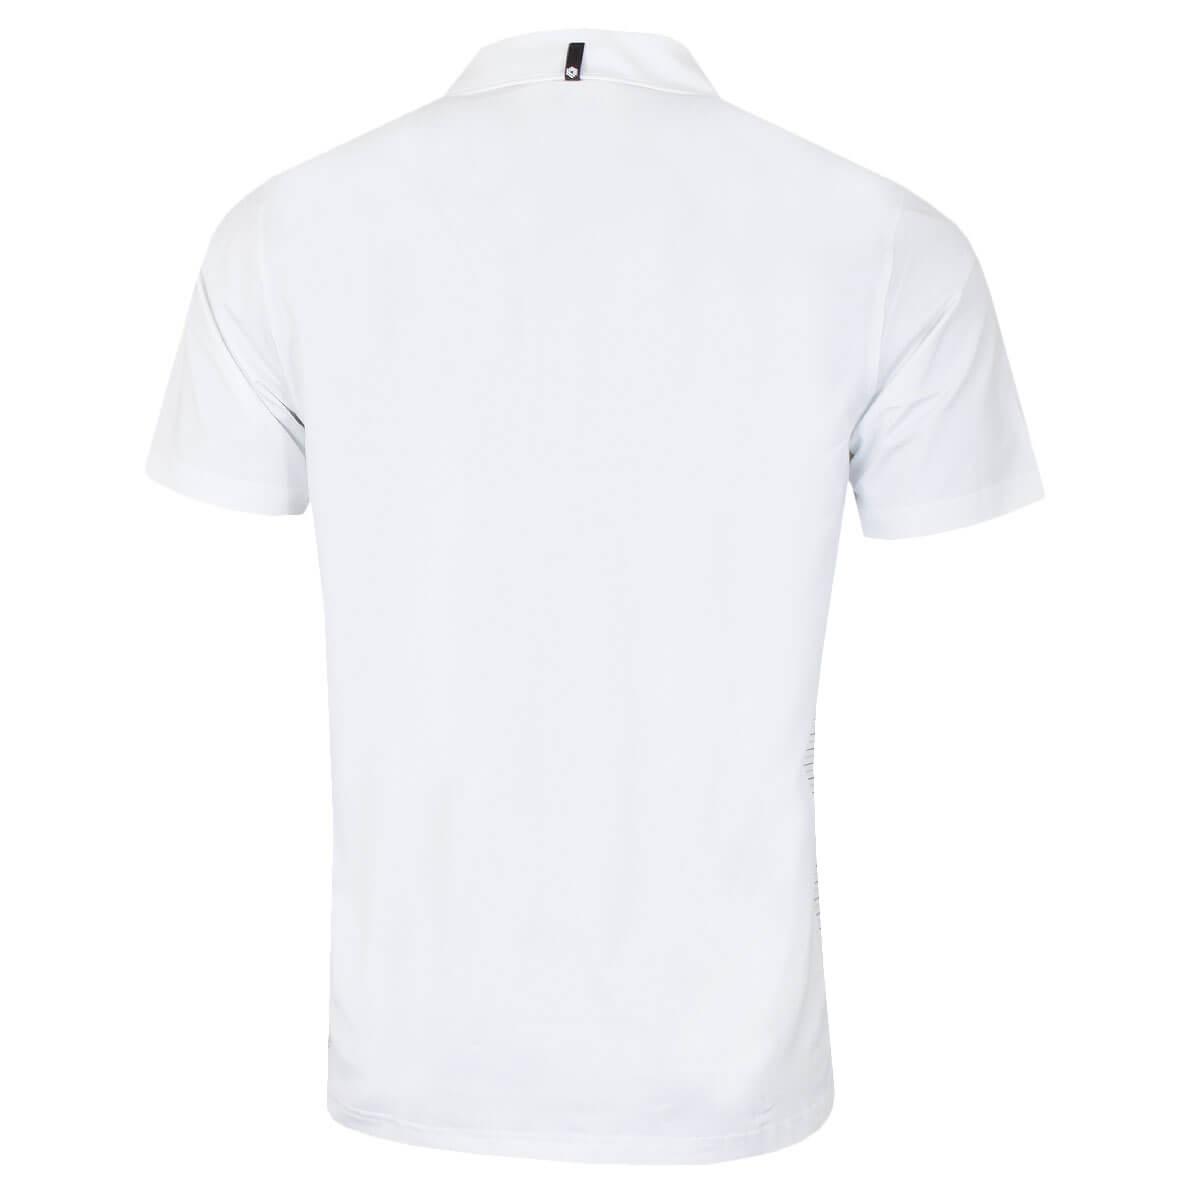 Puma-Golf-Mens-Highlight-Stripe-DryCELL-UPF-40-Stretch-Polo-Shirt thumbnail 12